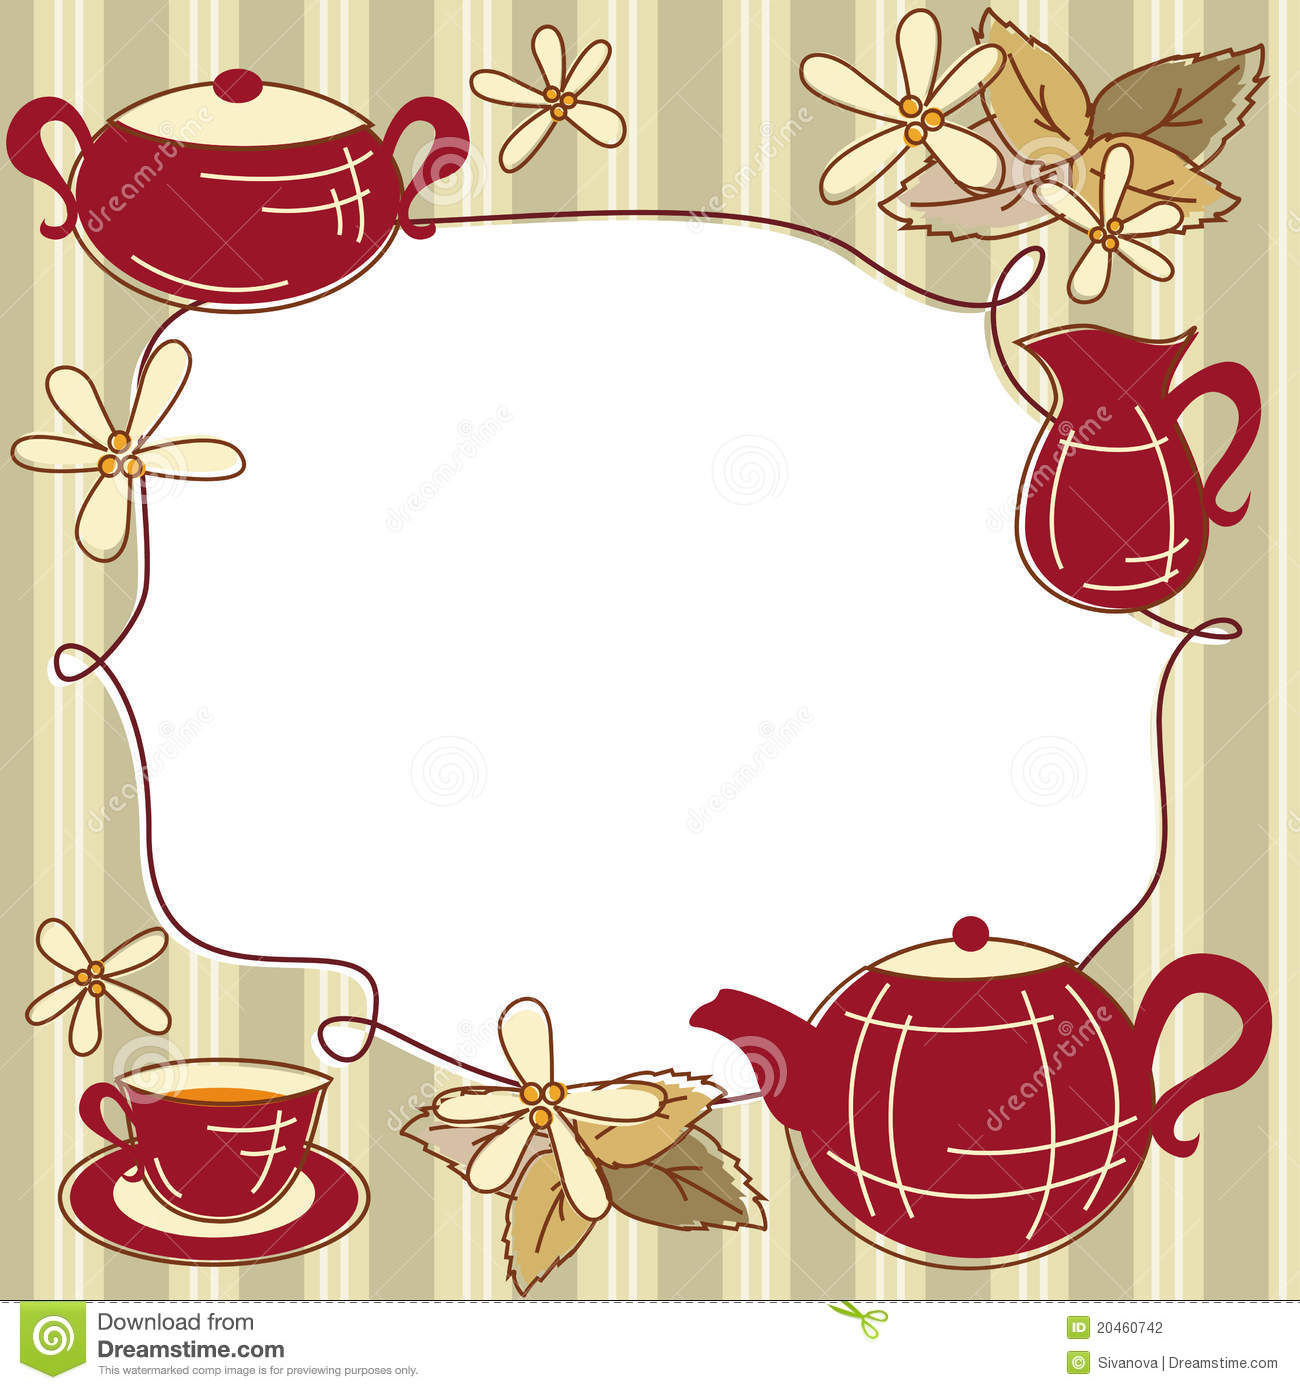 чай-меню-карточки-20460742.jpg